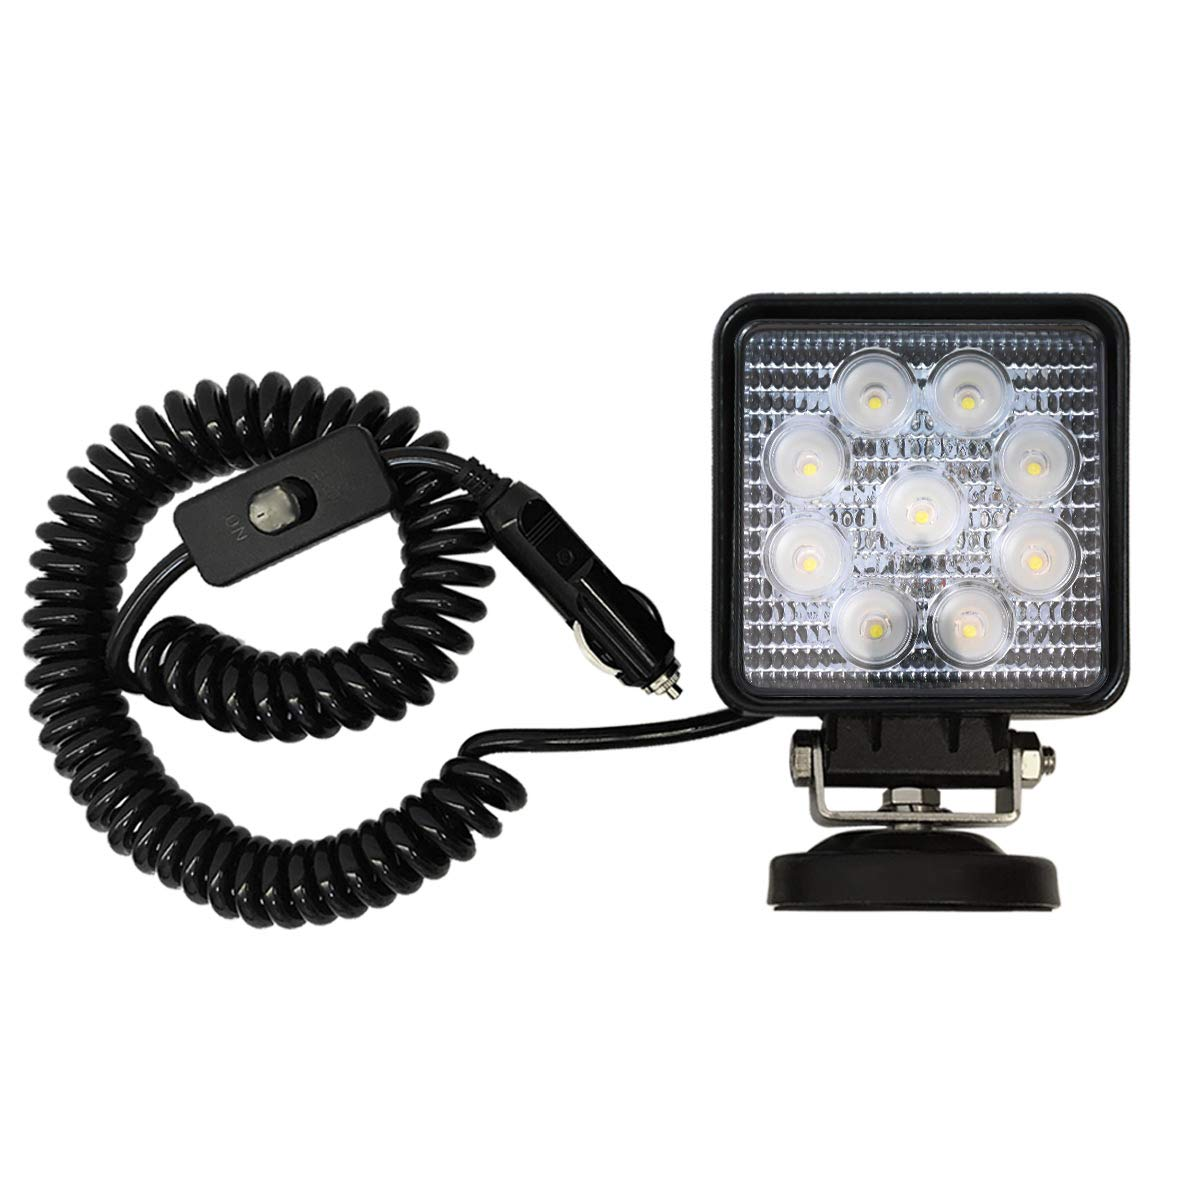 27W LED Work Light Portable Automotive LED Flood Light Off Road Flood Beam Lamp Magnetic Flood Light Talin Factor